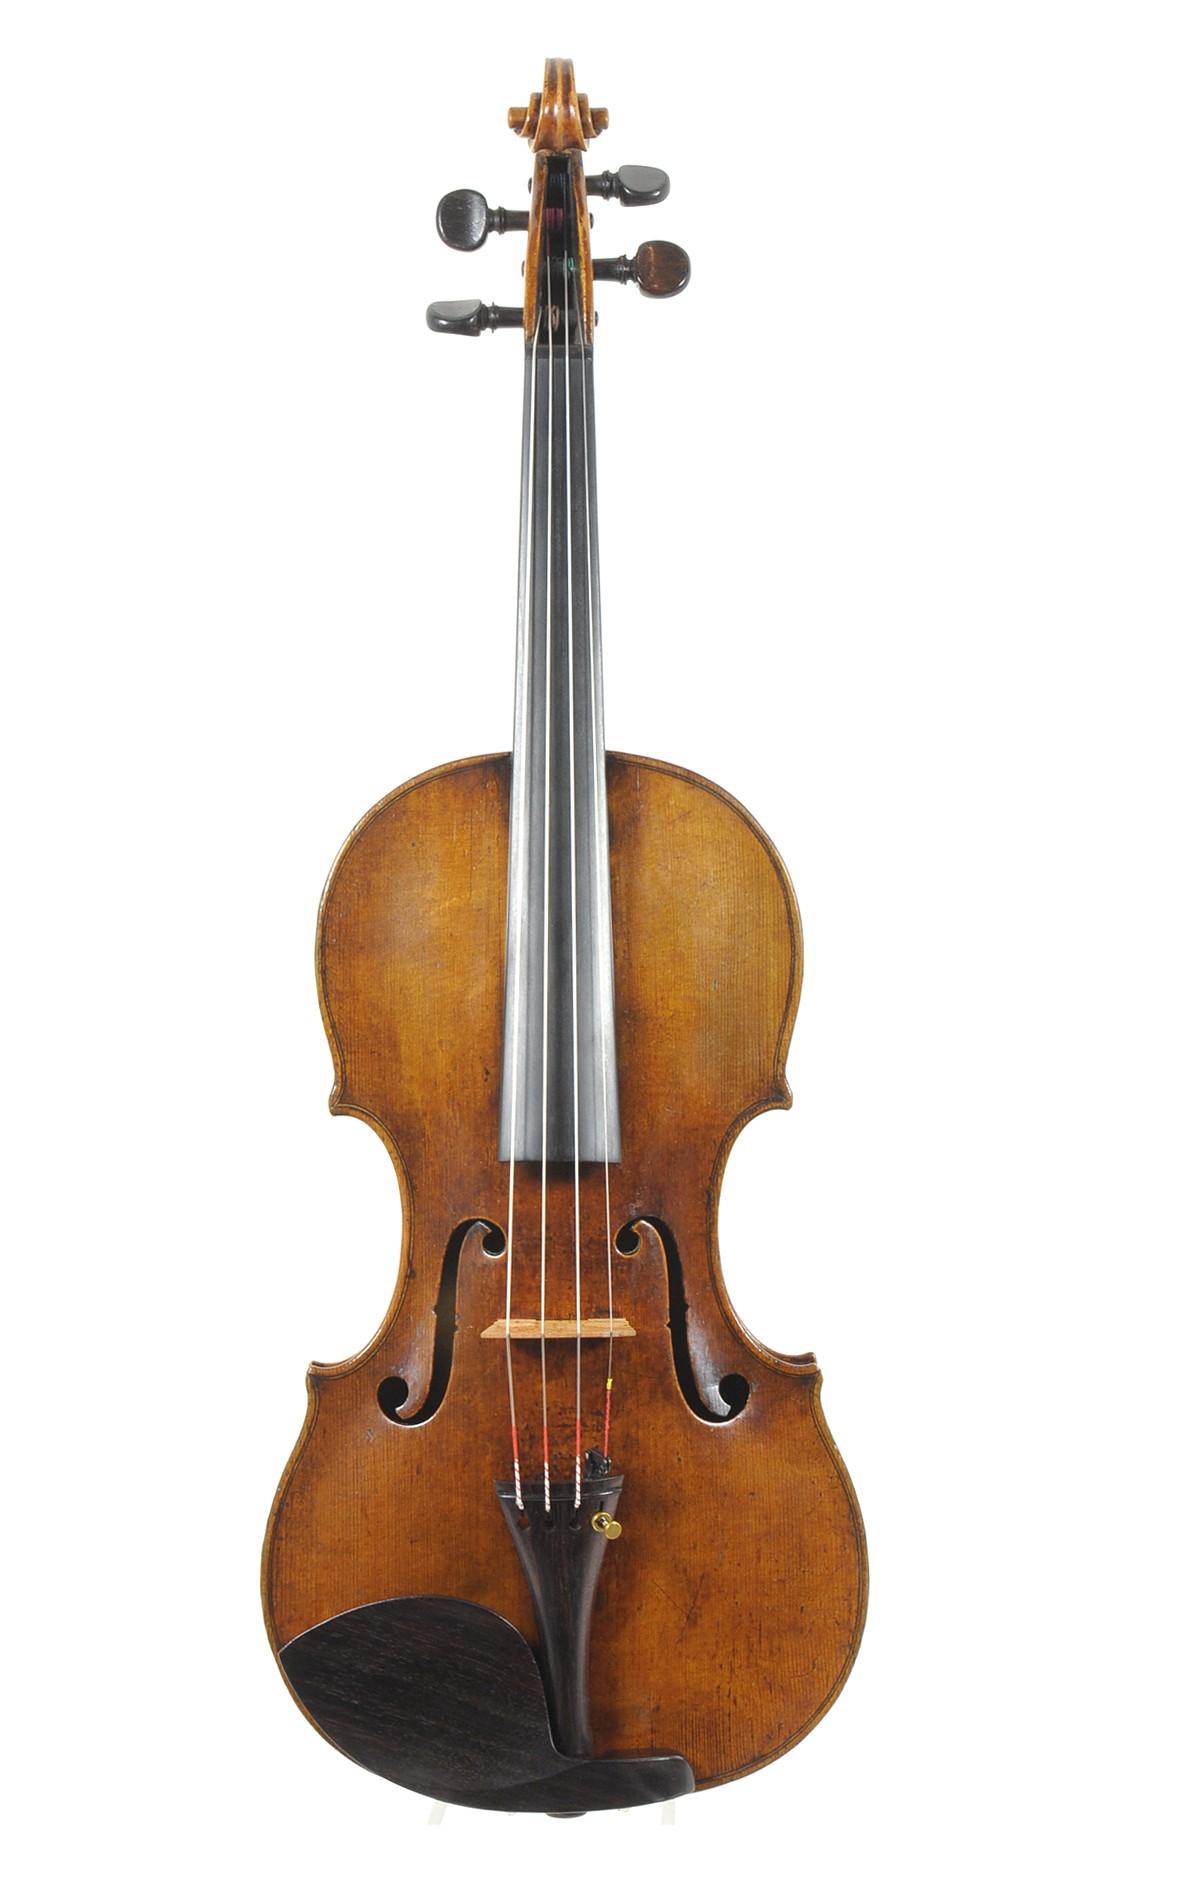 Fine stringed instruments, 18th century master violin - top